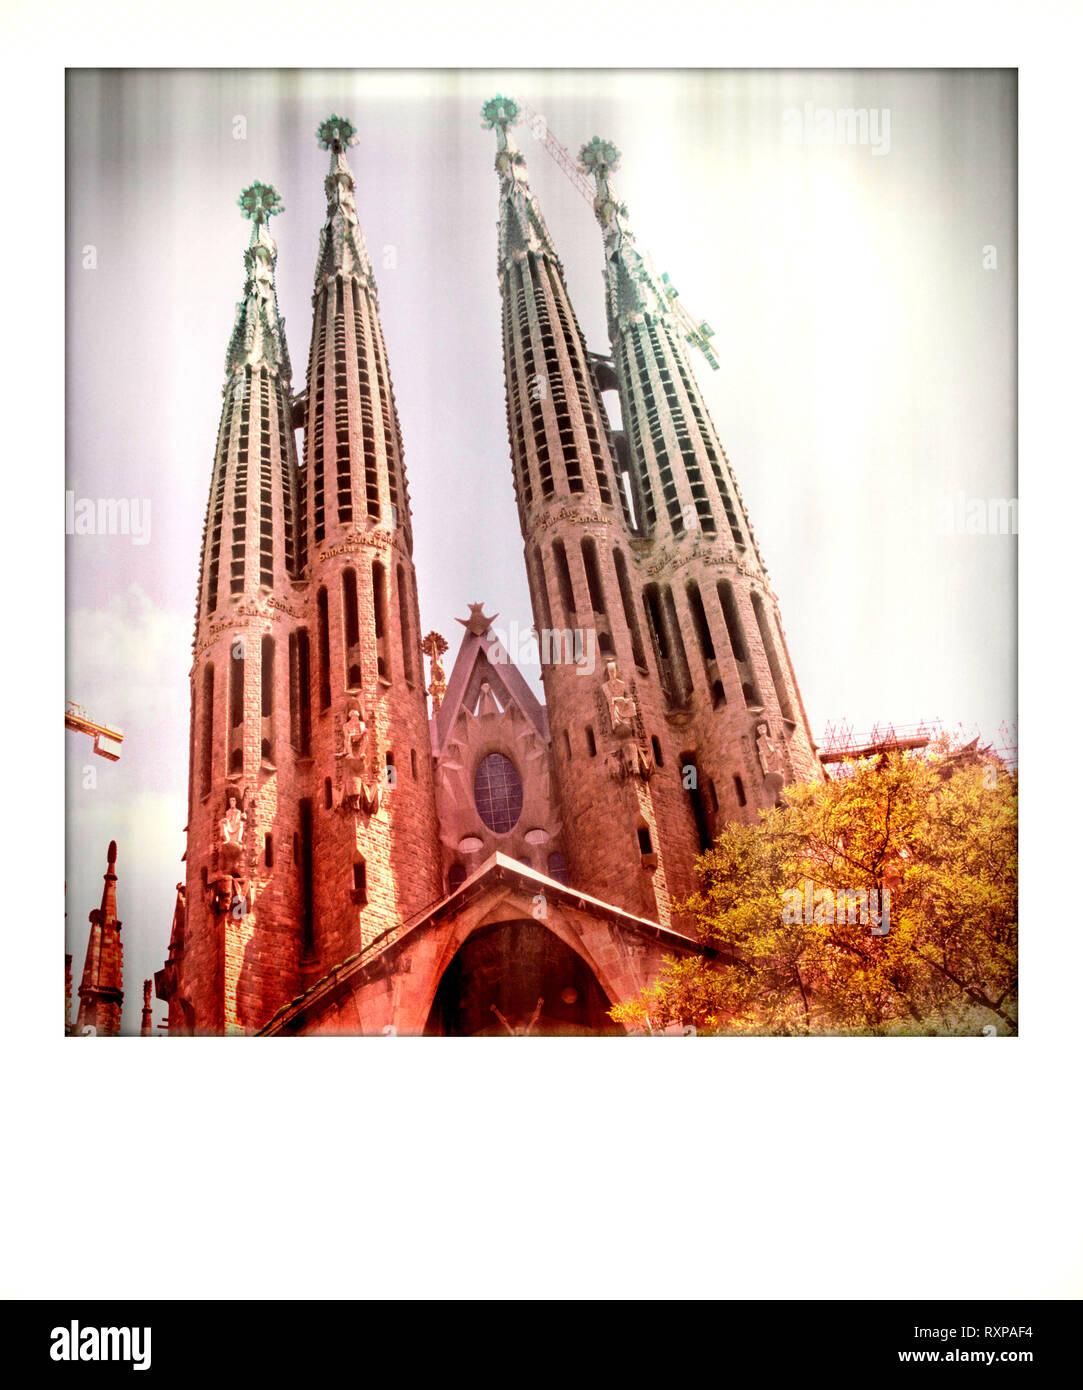 Polaroid effect, Sagrada Familia church, Barcelona, Spain - Stock Image